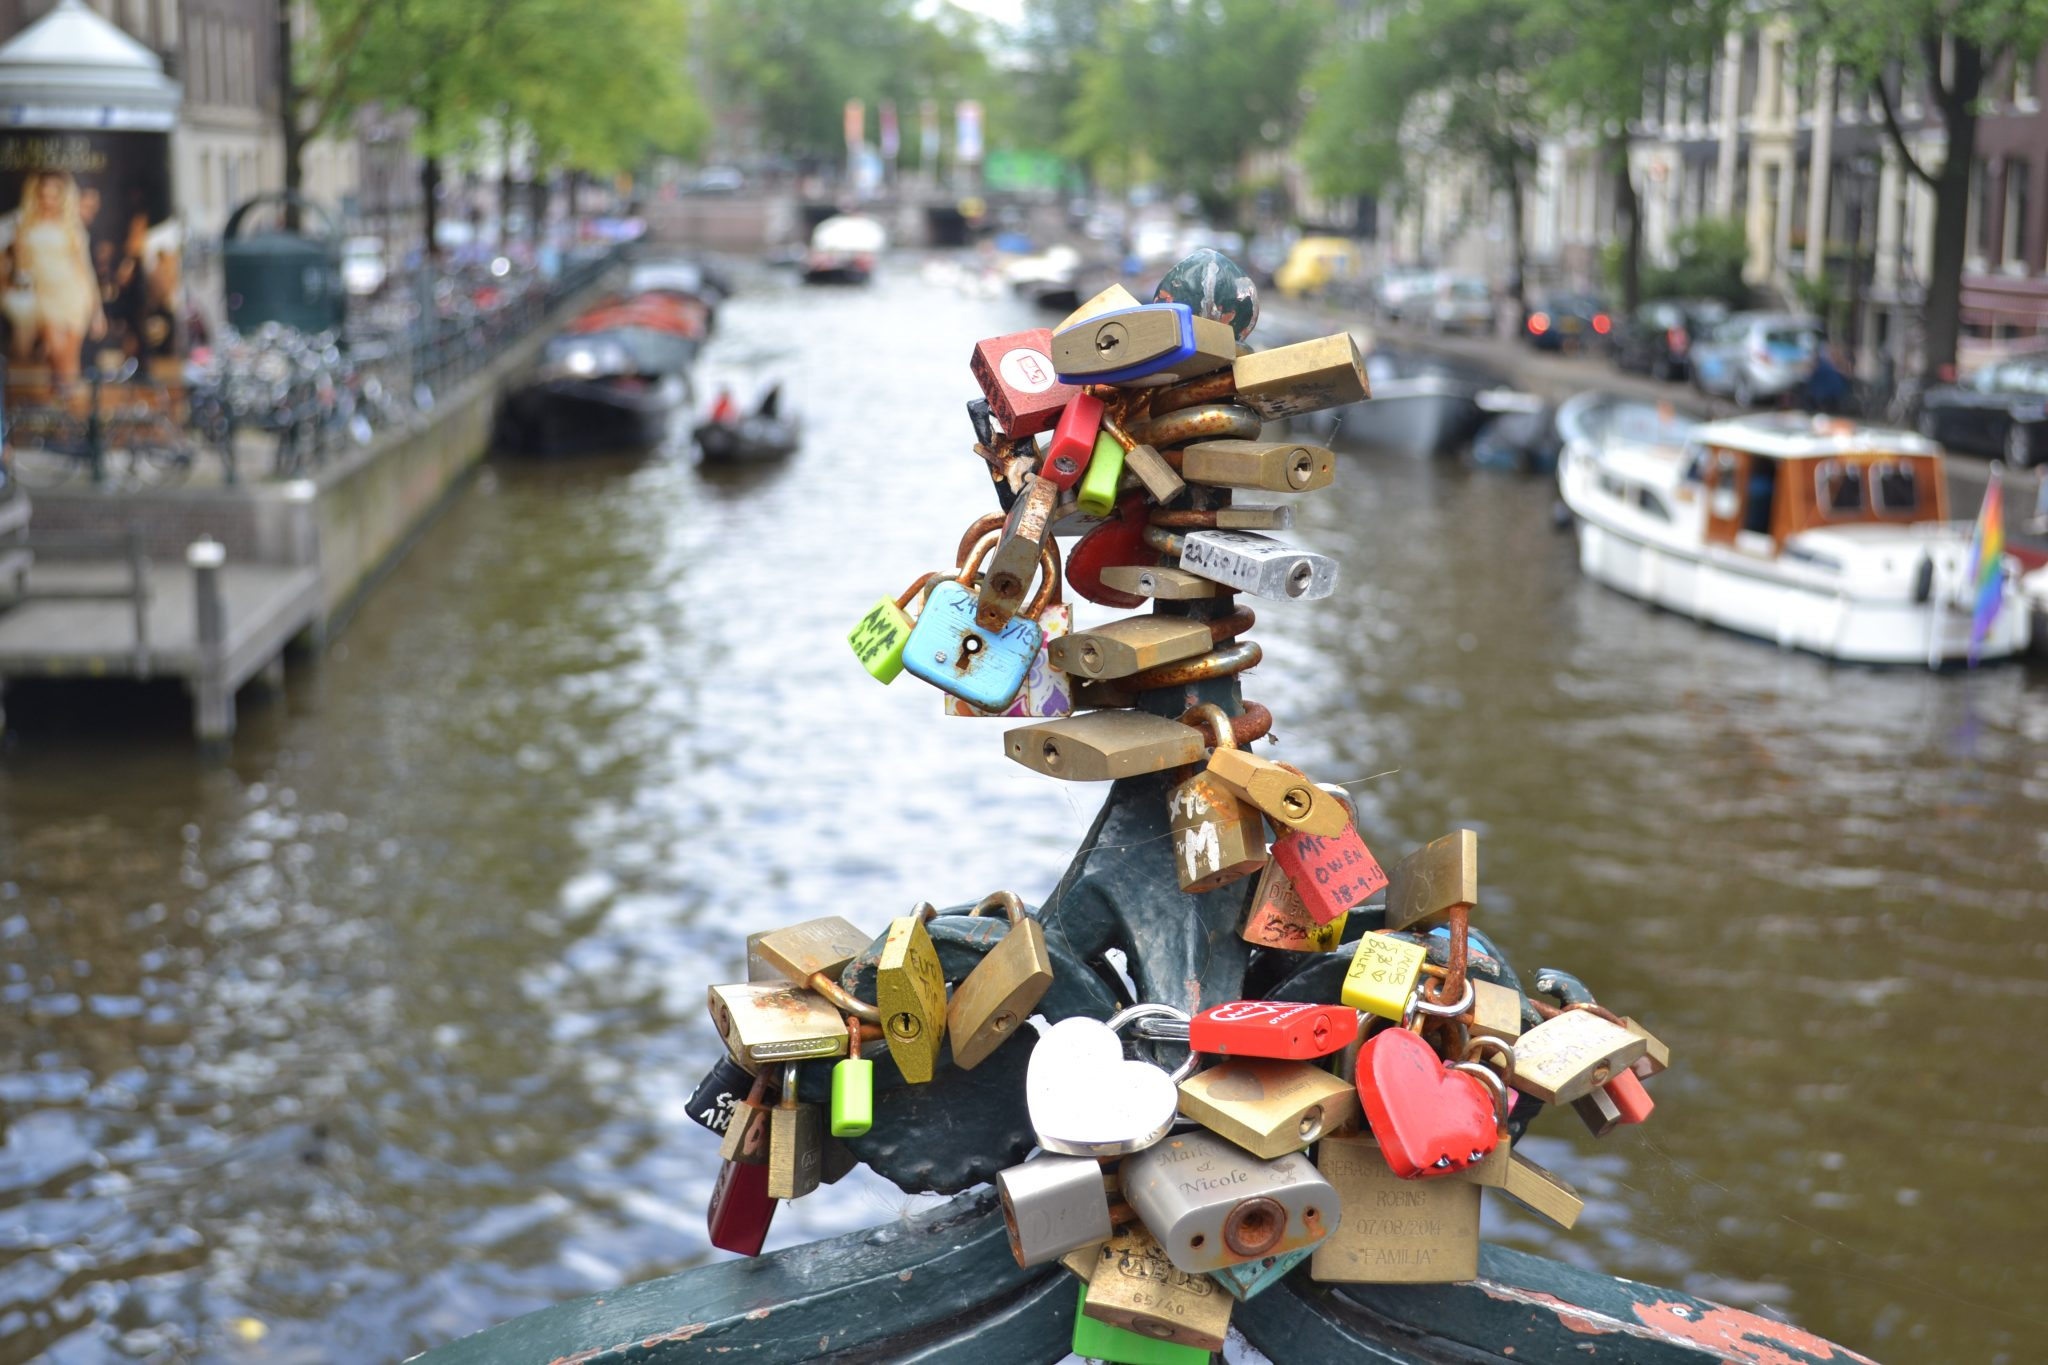 Travel Diary: Amsterdam | Netherlands - DSC 0225